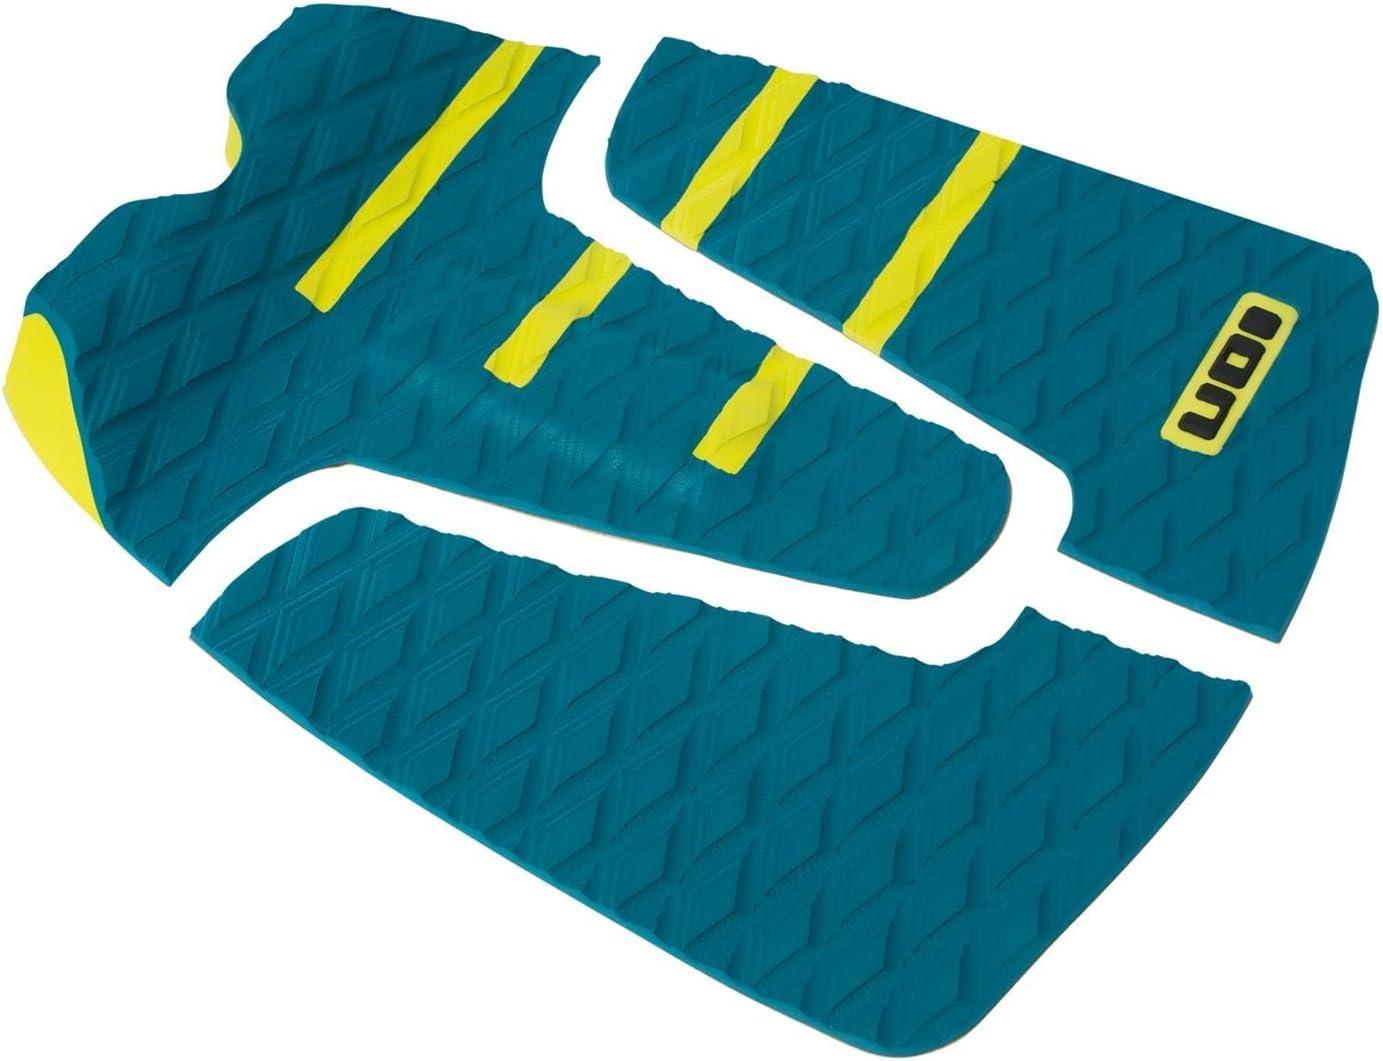 ION Footpad Deck Grip 3-tlg Petrol/Gelb Surfboard Wellenreiter